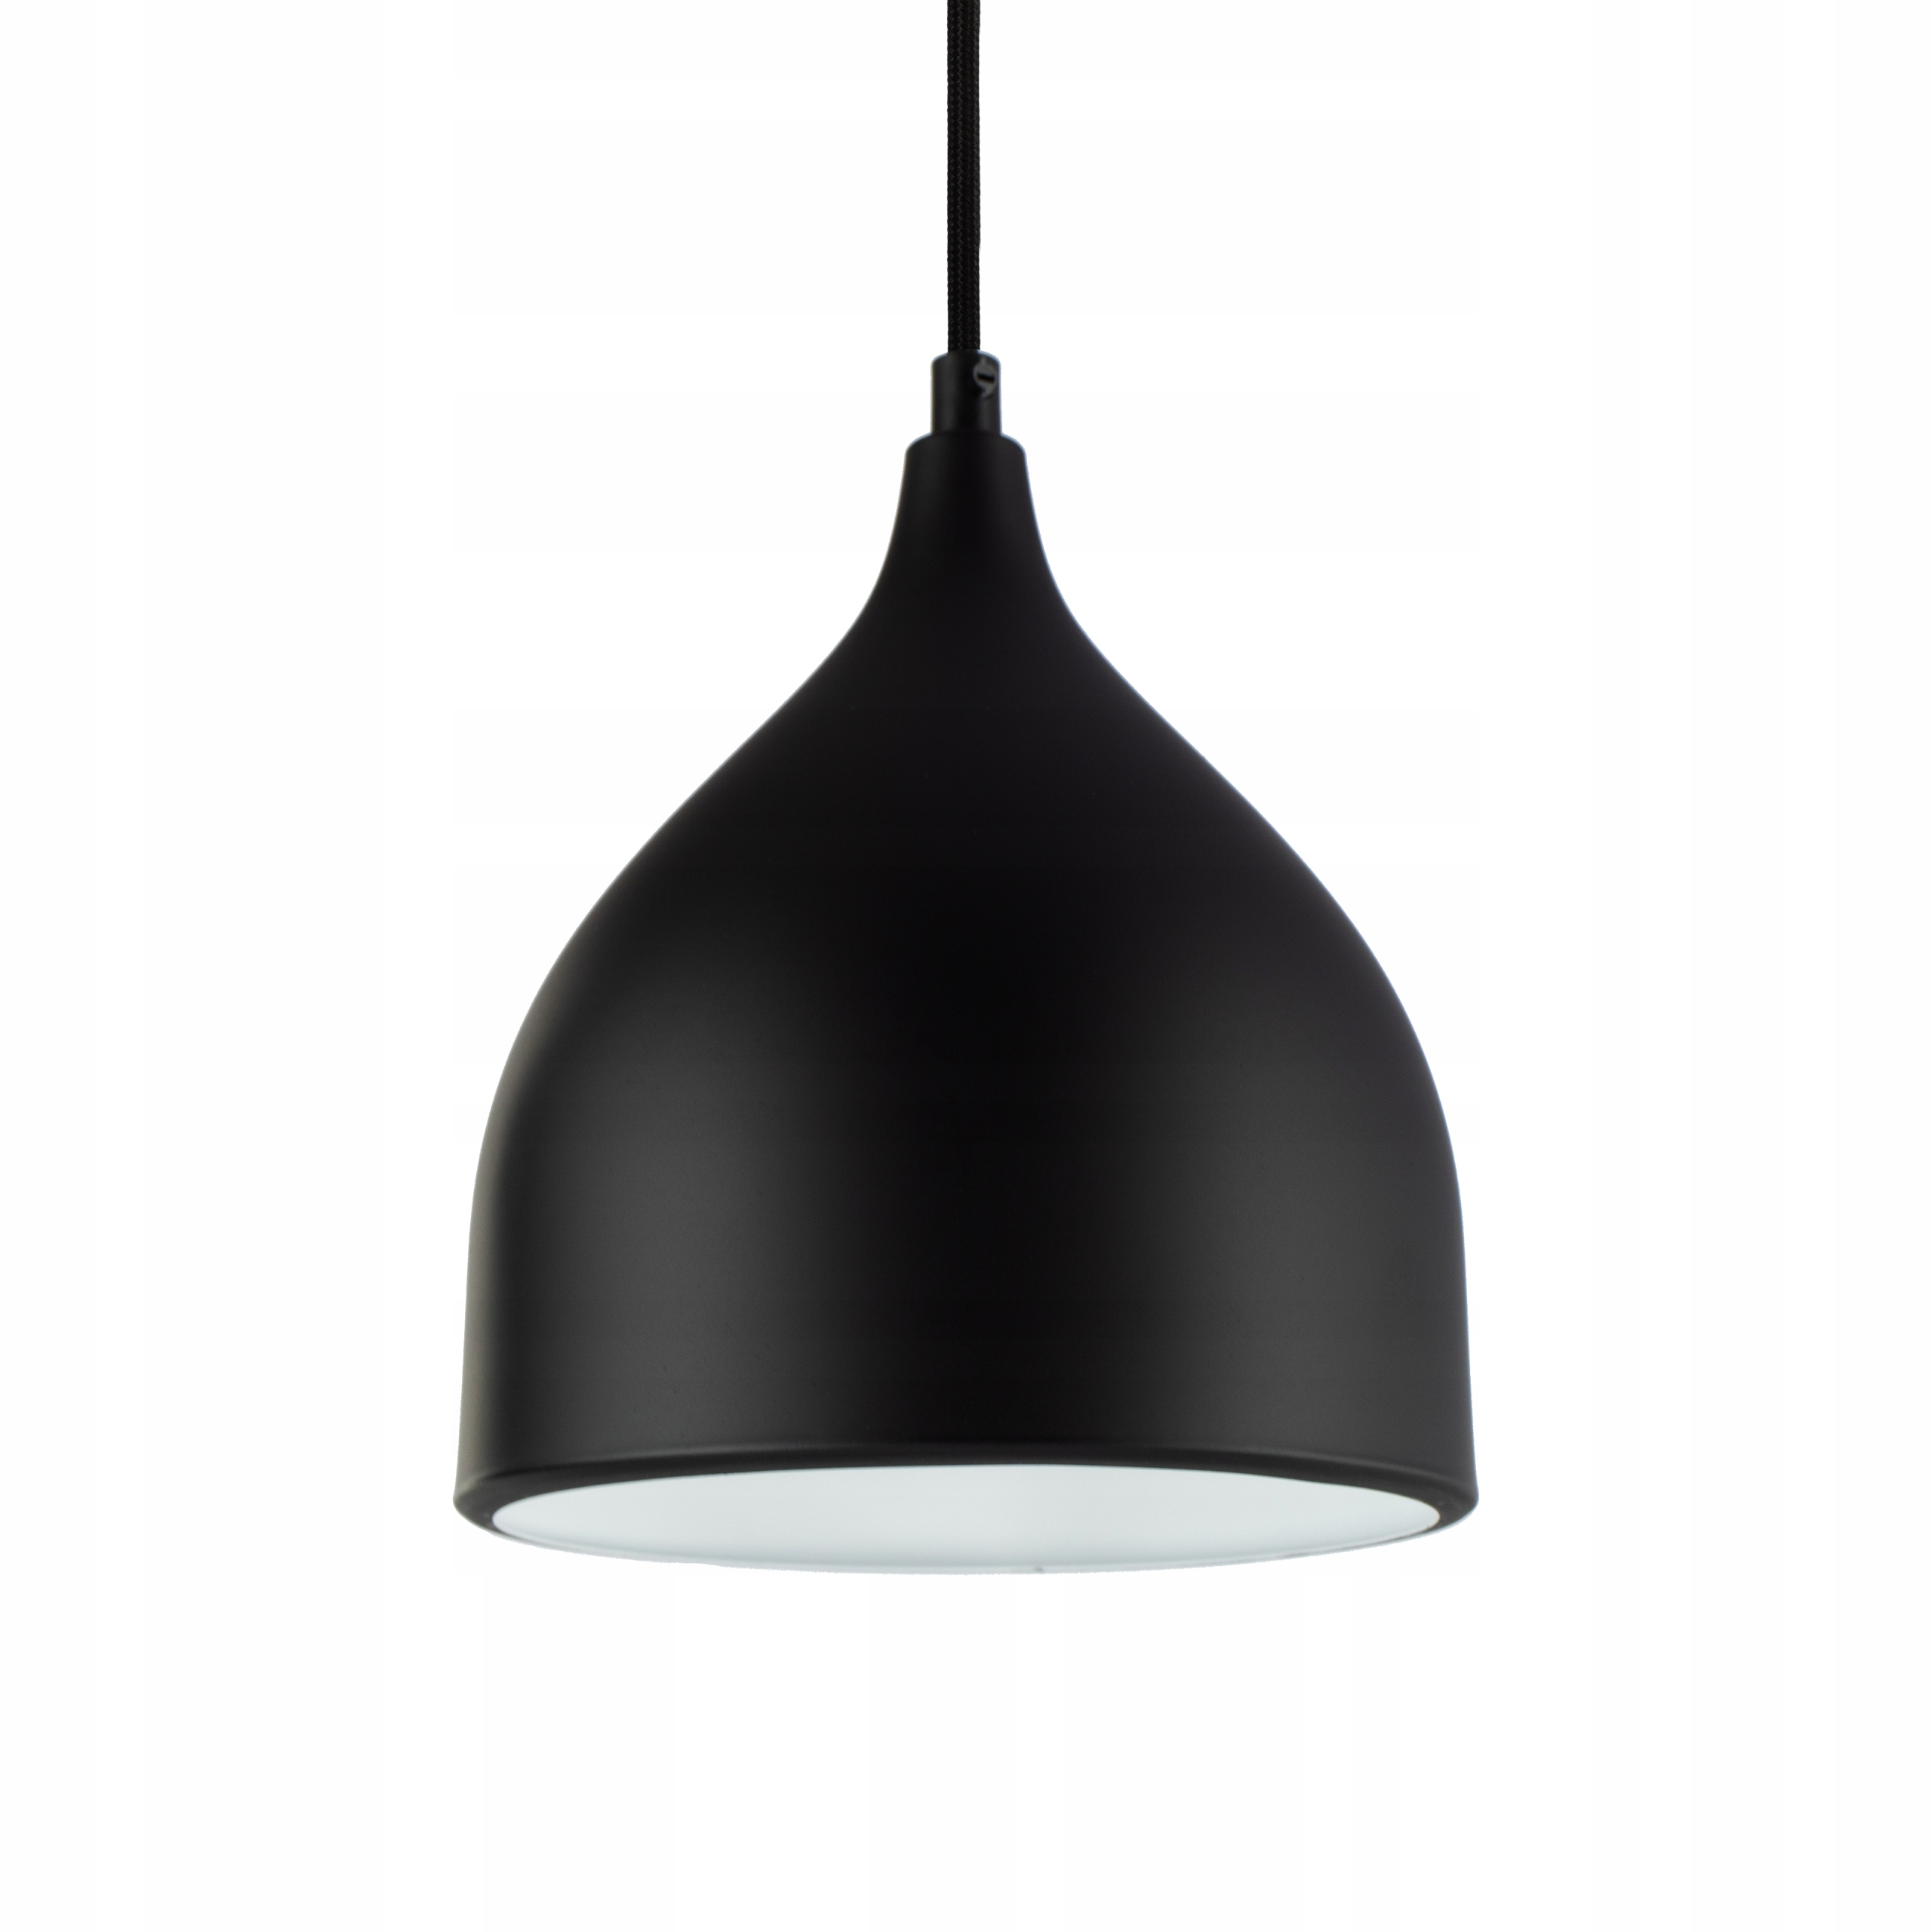 Lampa sufitowa wisząca potrójna Loft SIMPLE